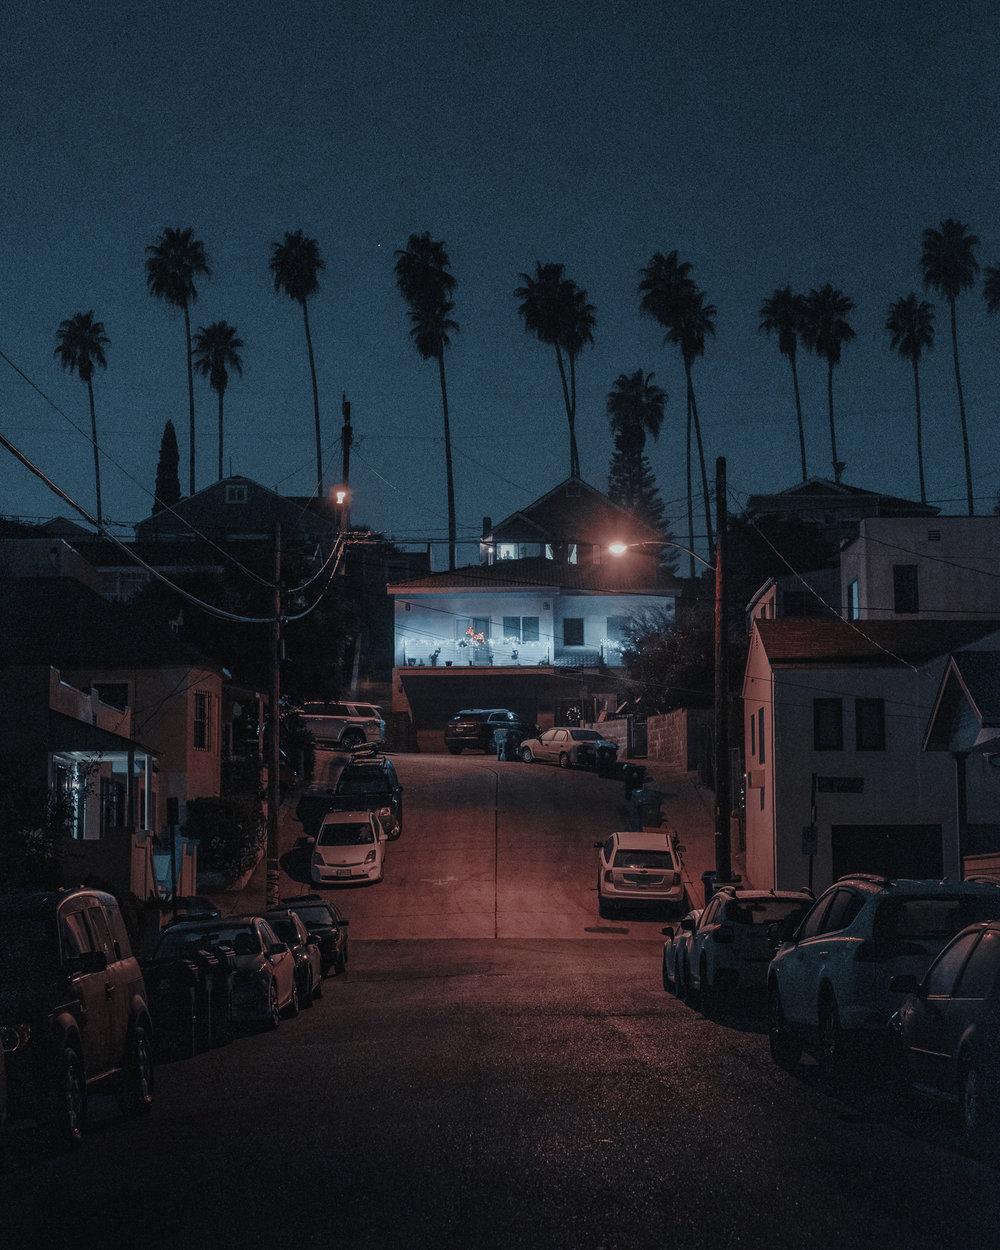 Nights-26.jpg